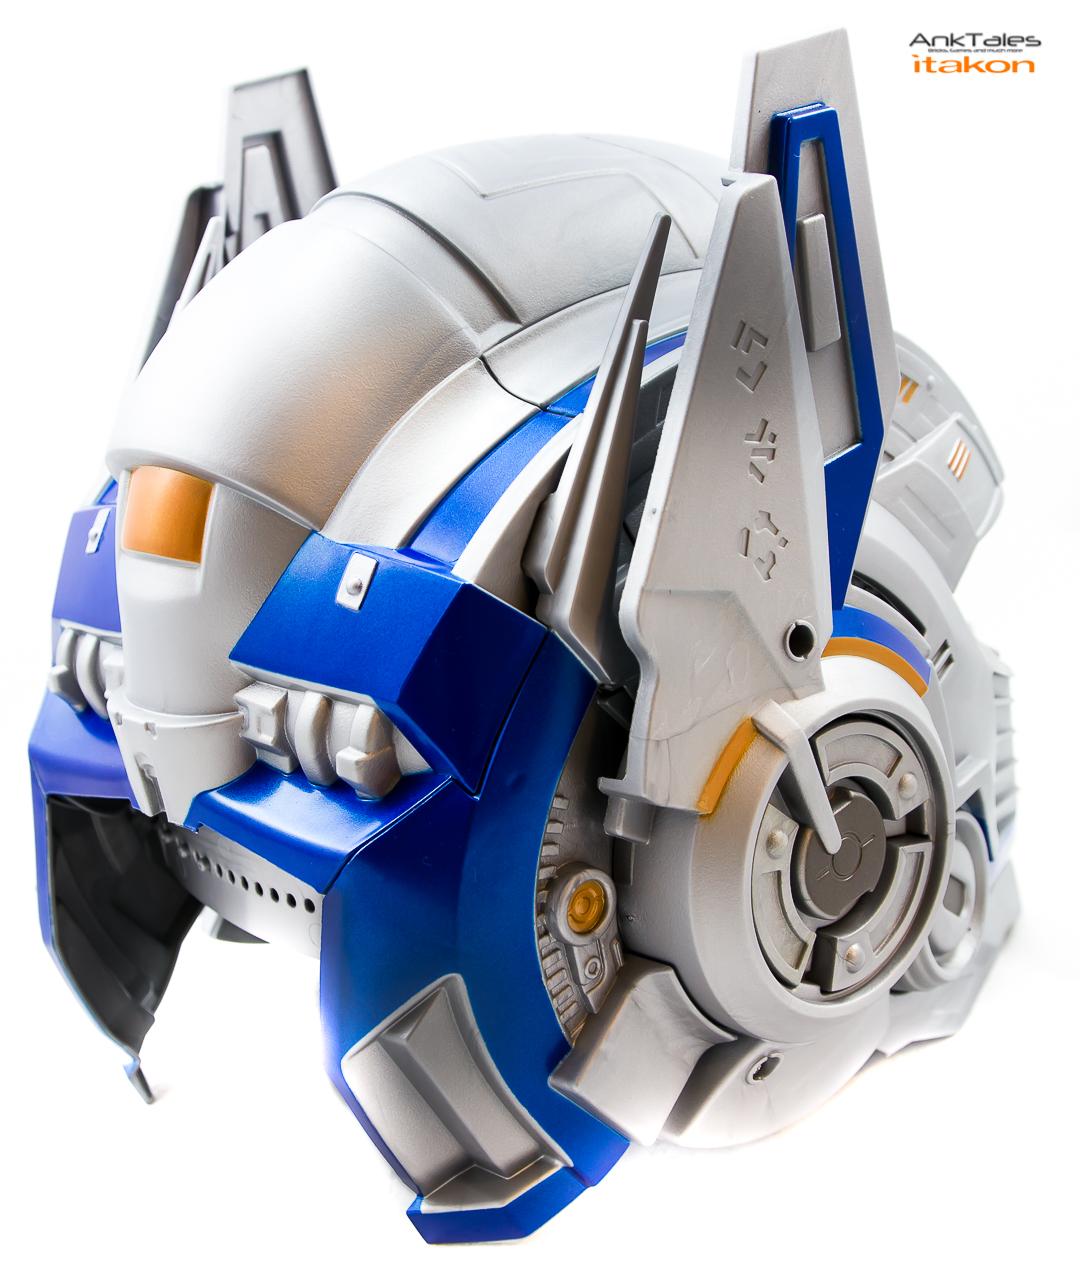 Link a Hasbro Optimus Prime helmet Anktales Itakon_0025